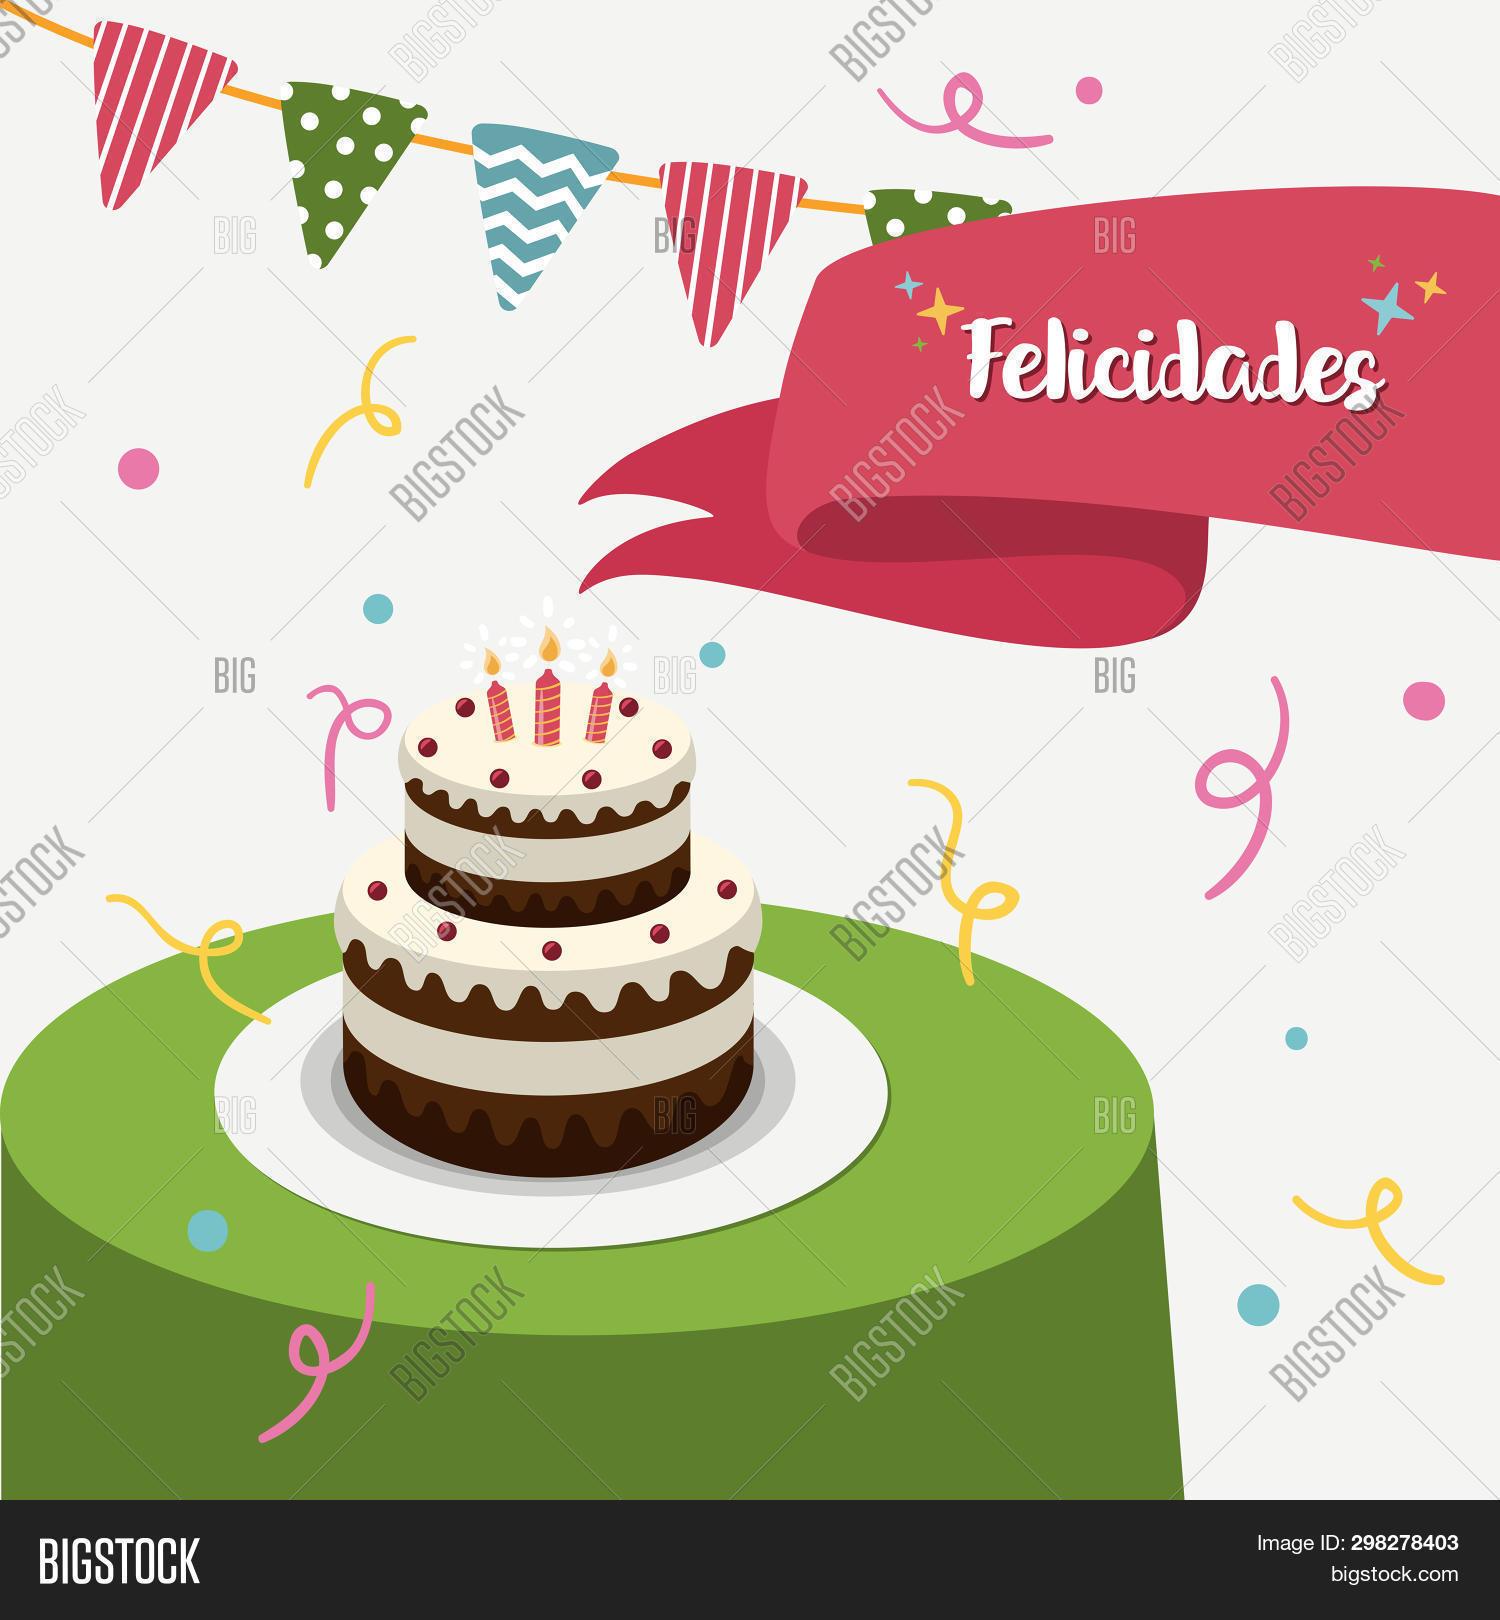 Admirable Happy Birthday Party Vector Photo Free Trial Bigstock Funny Birthday Cards Online Inifodamsfinfo